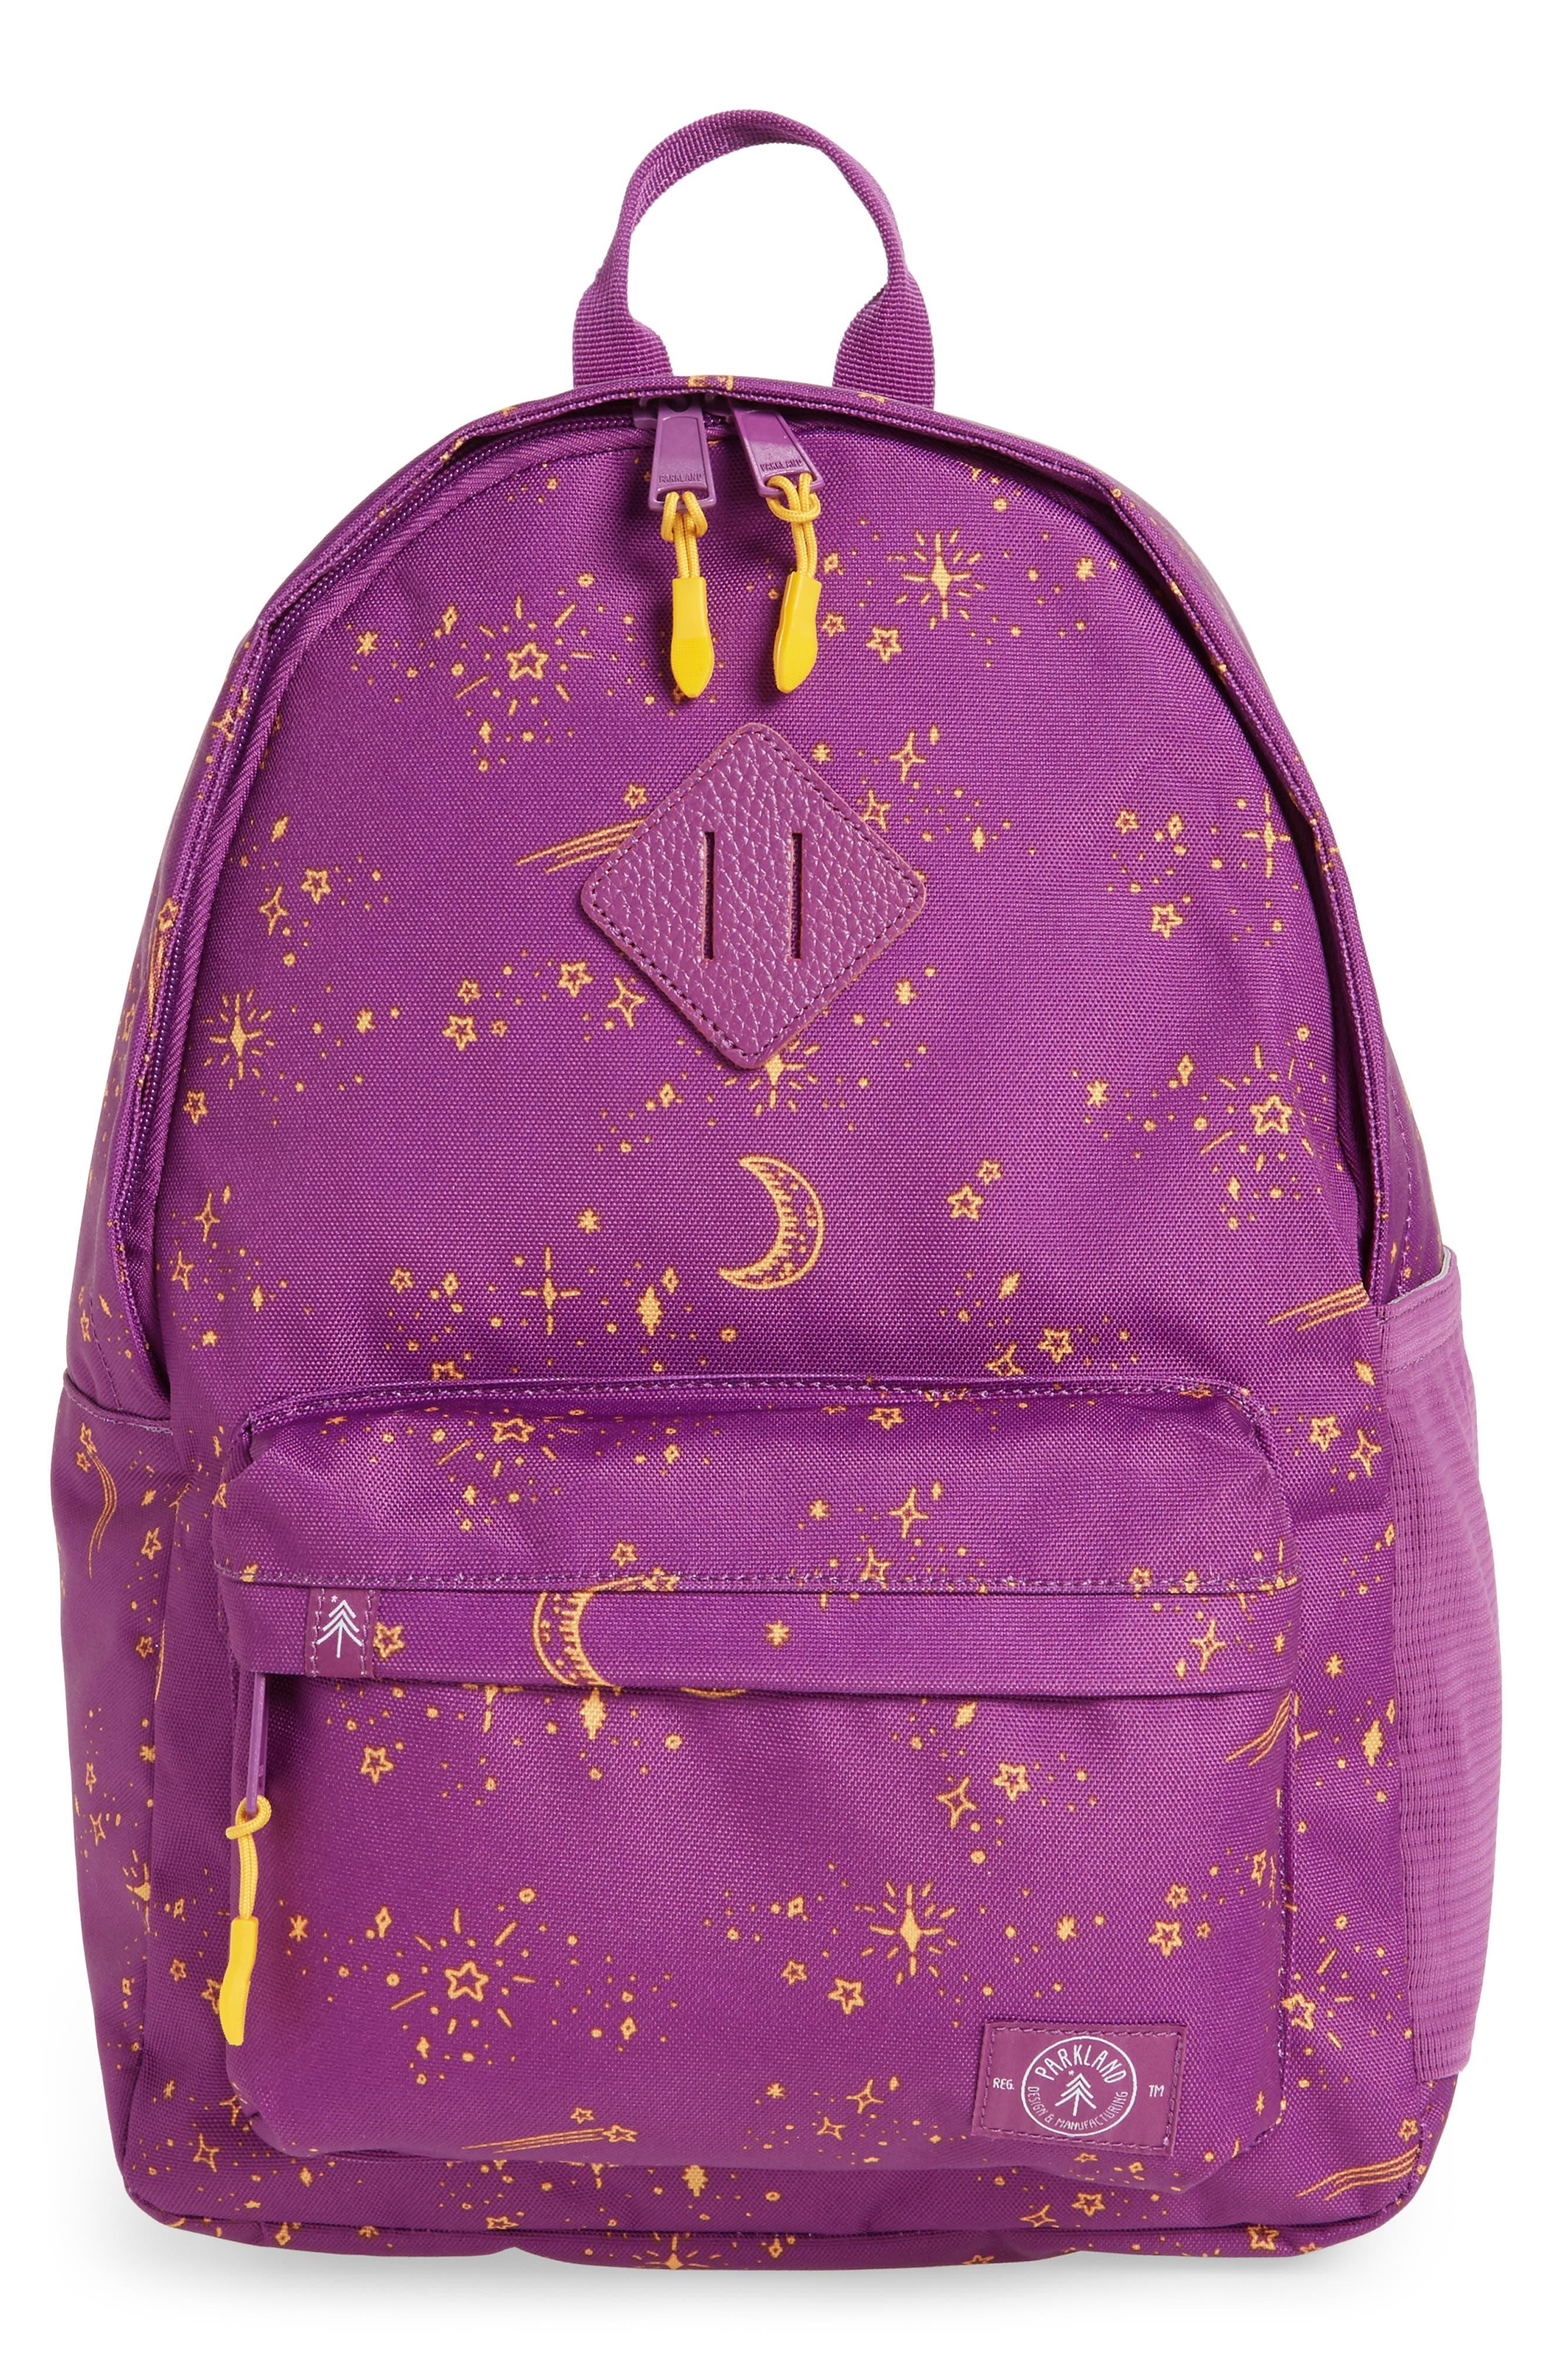 Bayside - Sweet Dreams Backpack,                         Main,                         color, 511